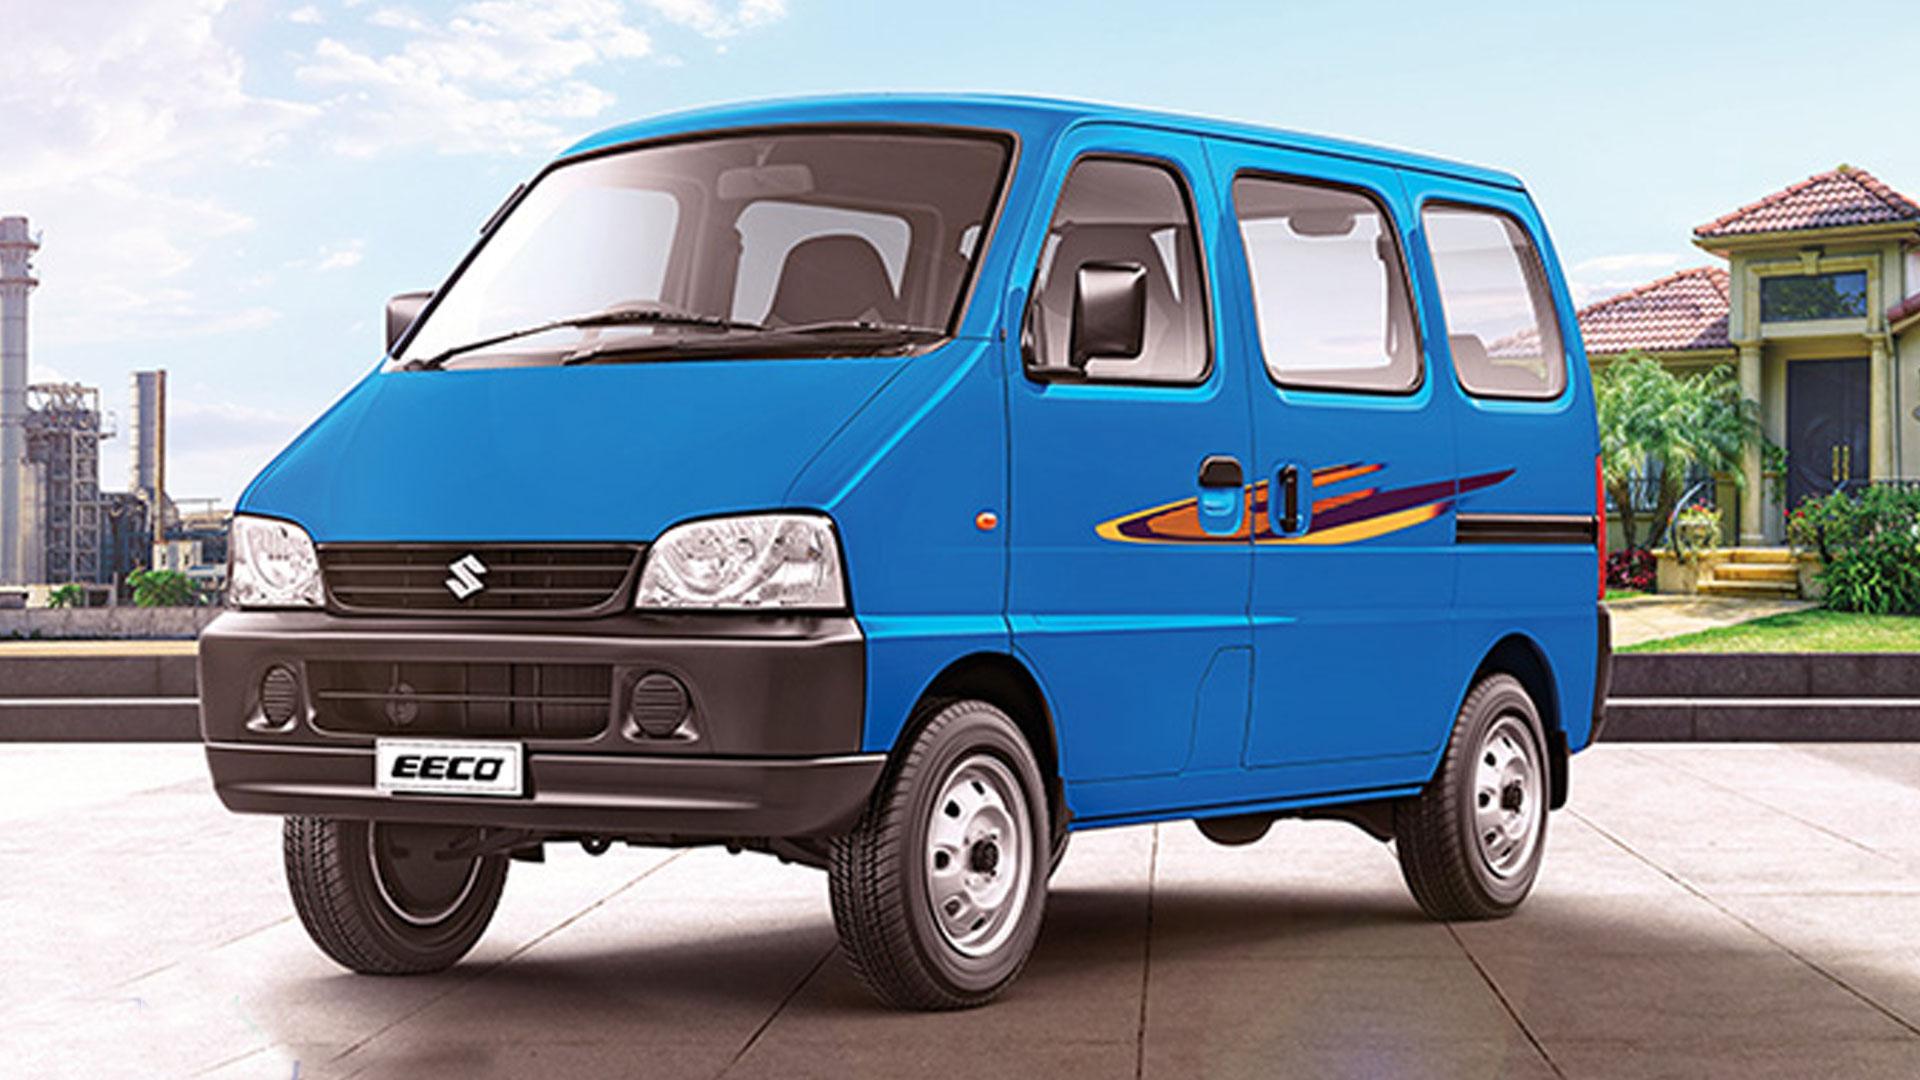 Maruti Suzuki Eeco 2019 5 Seater